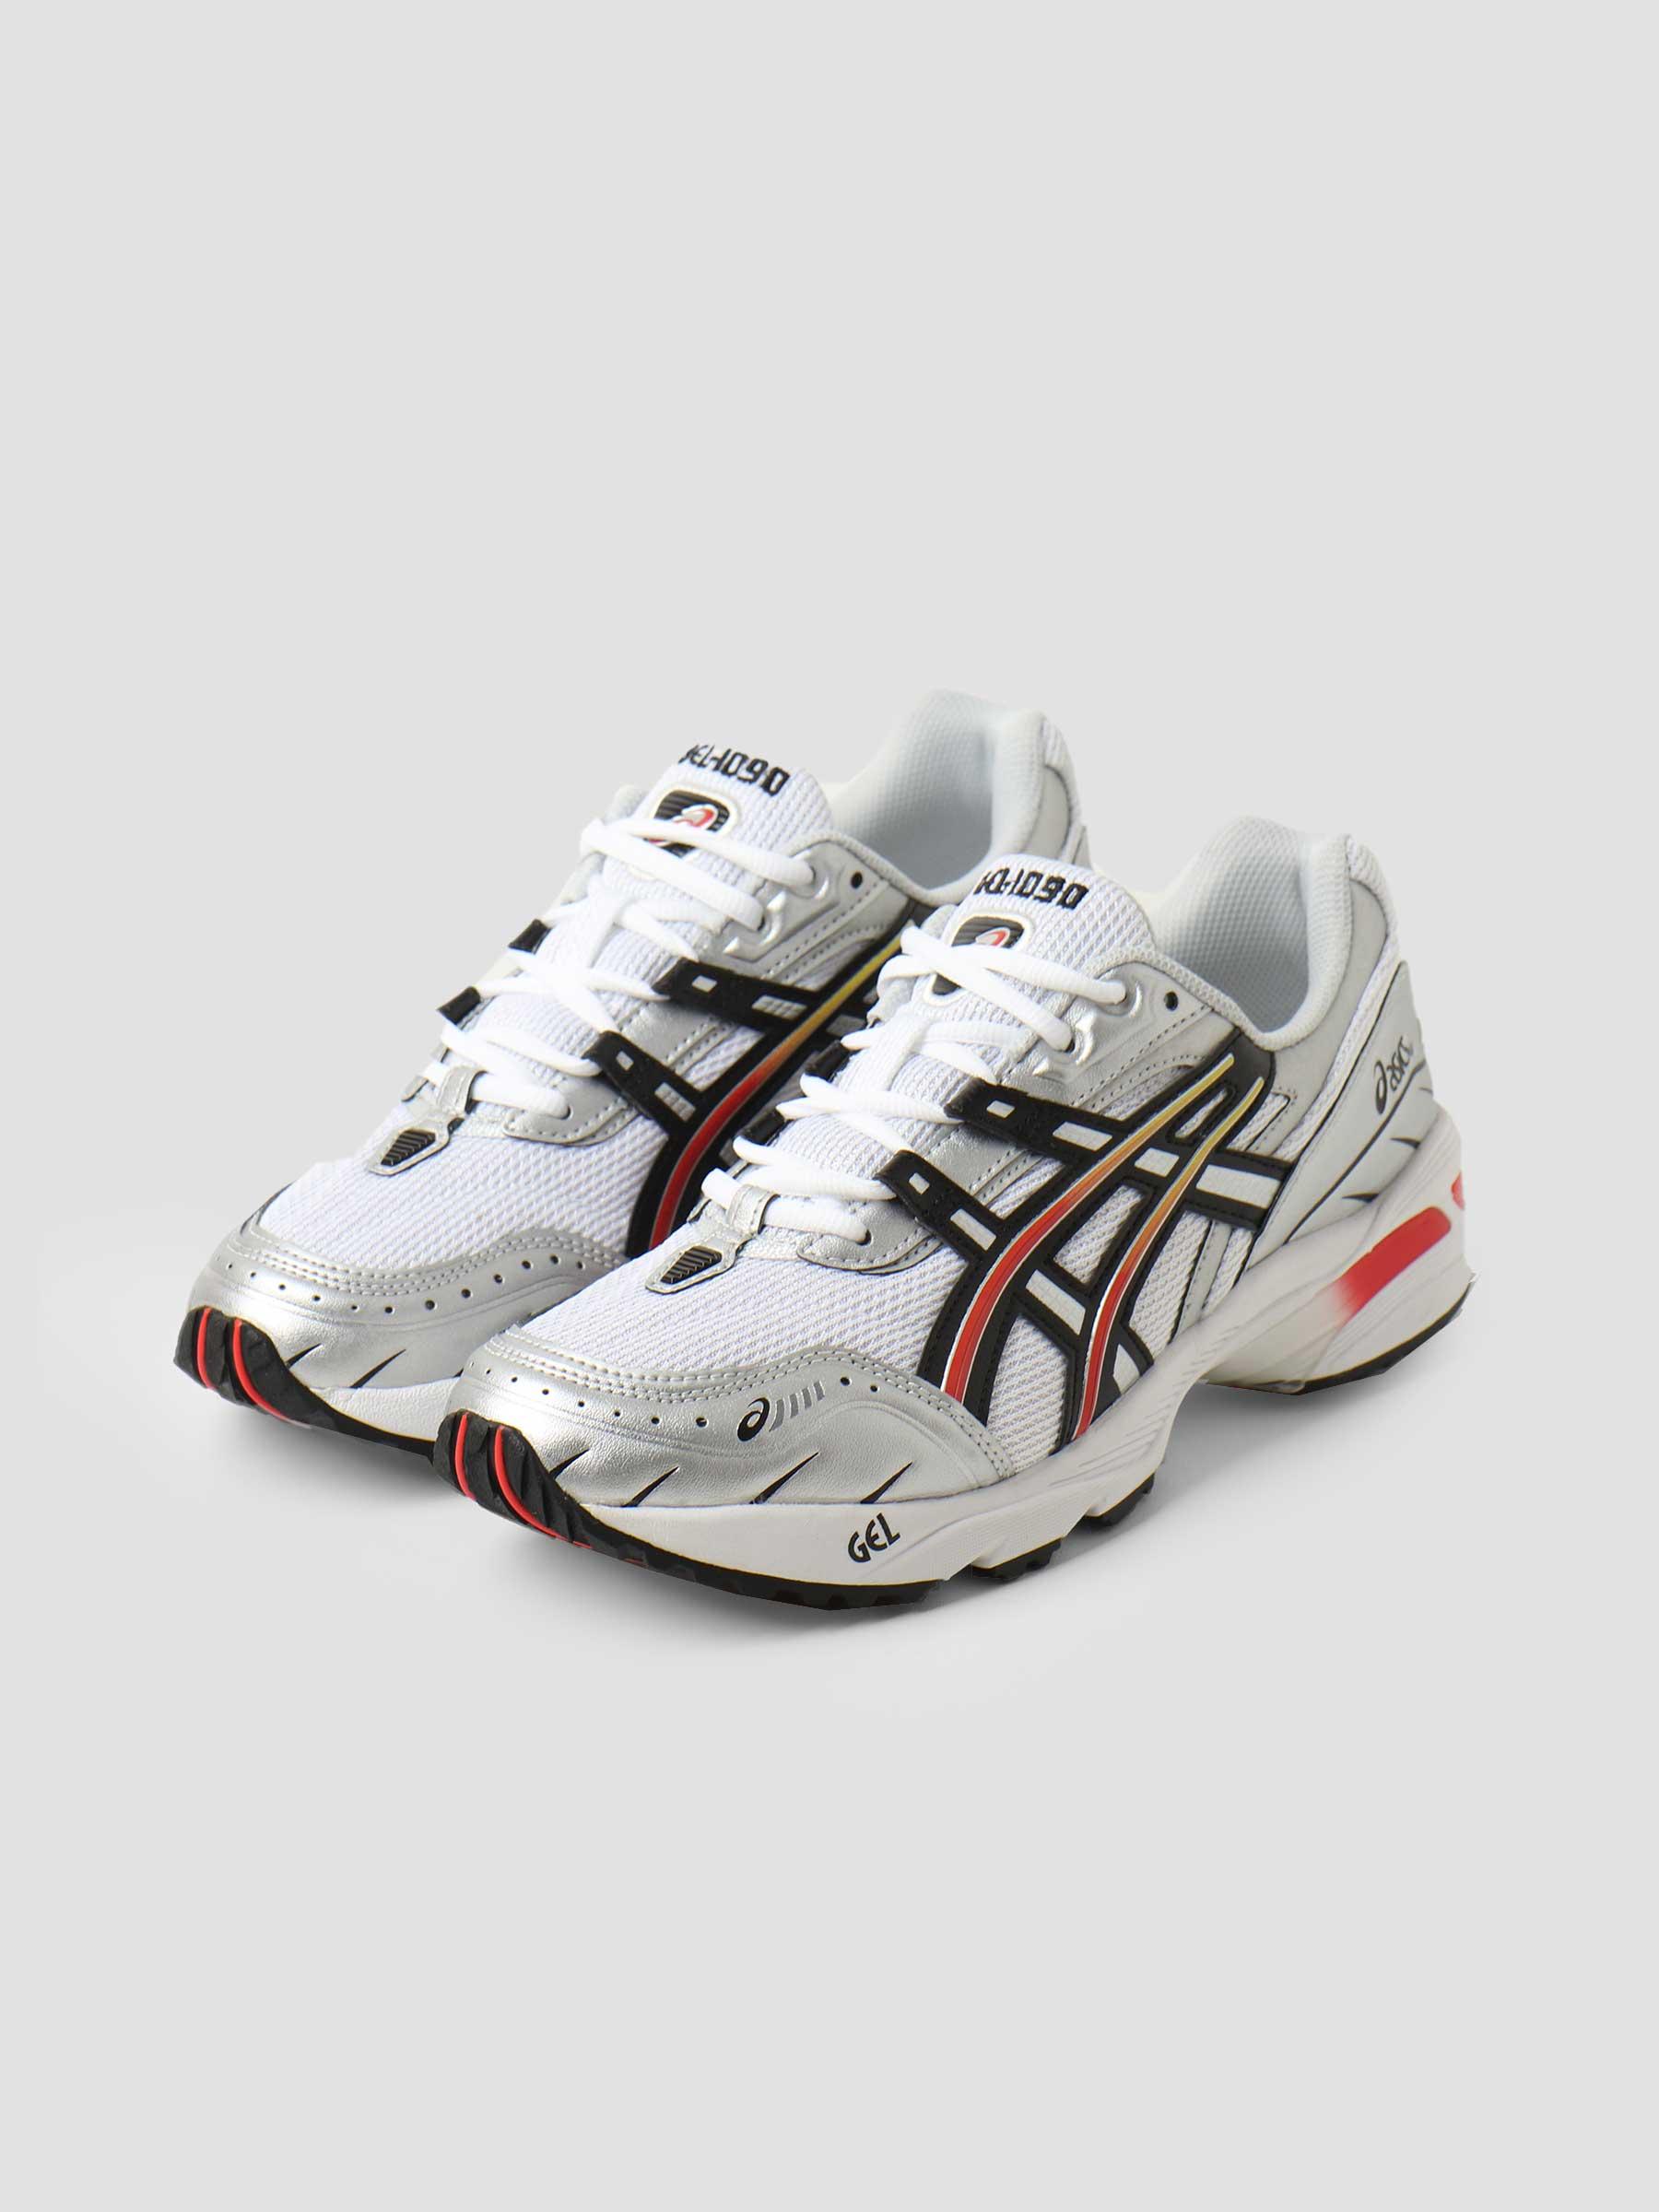 GEL-1090 White Black 1021A285-100